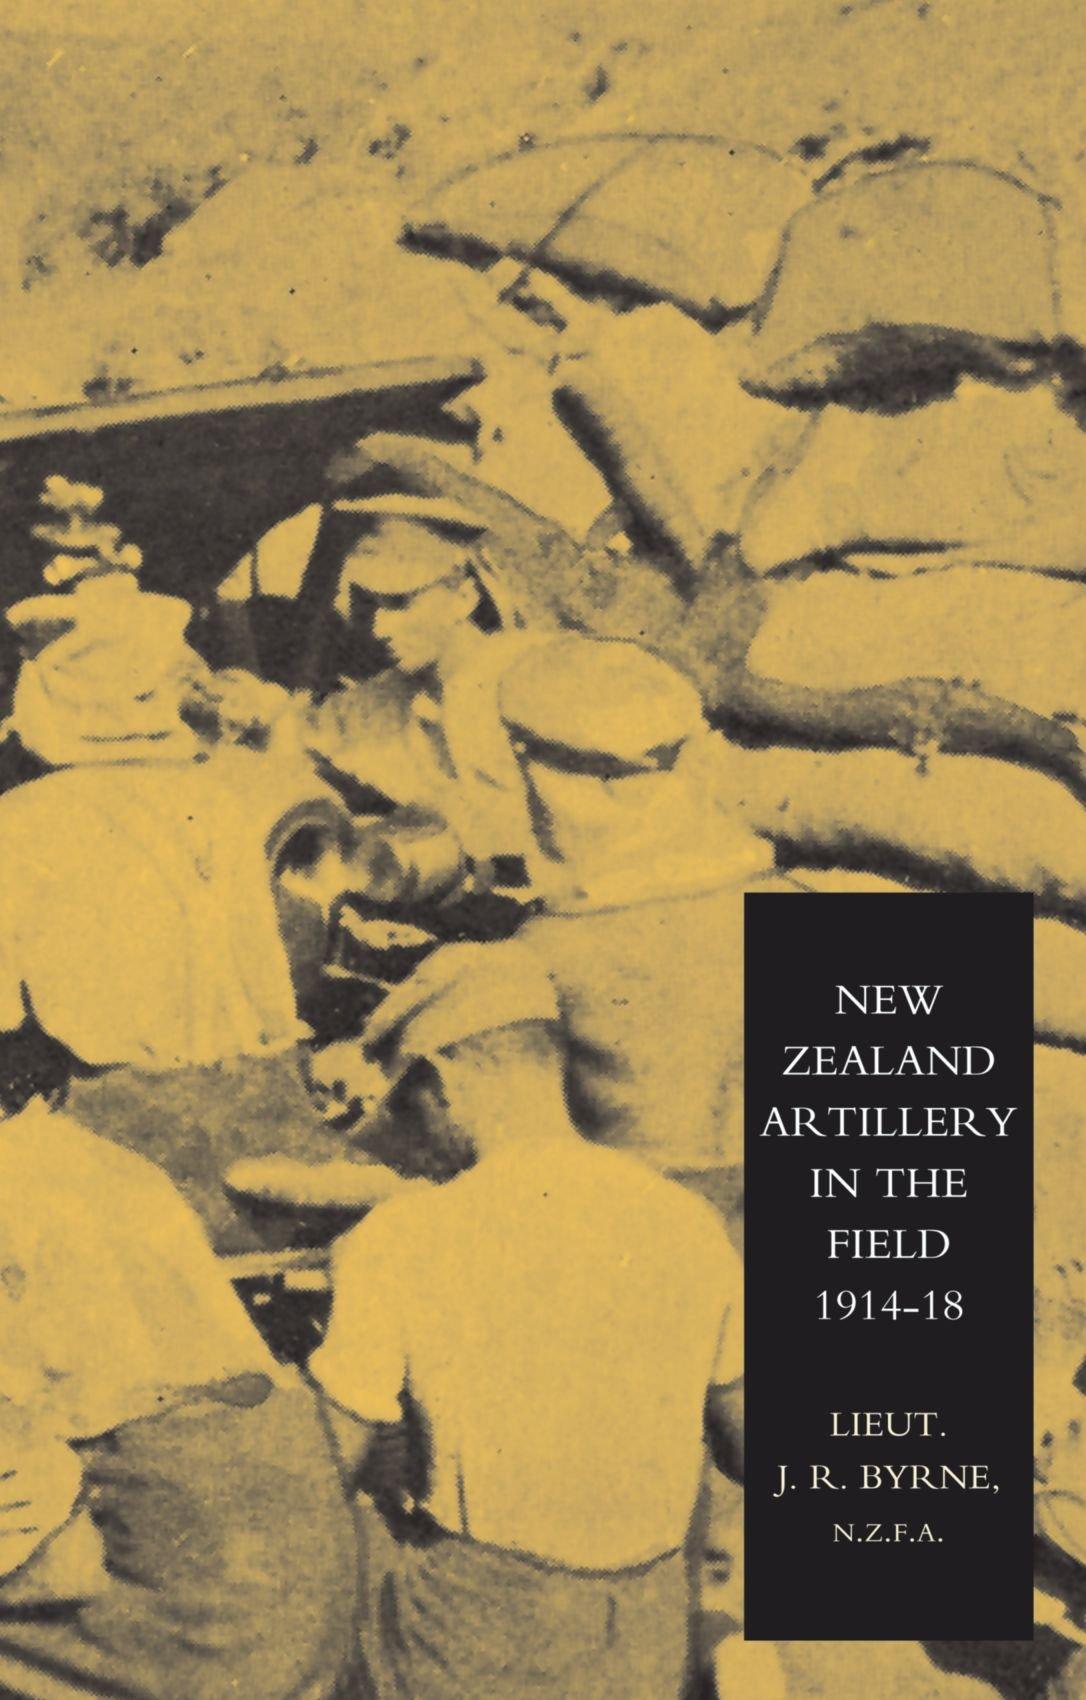 Download New Zealand Artillery In The Field: The History Of The New Zealand Artillery, 1914-1918: New Zealand Artillery In The Field: The History Of The New Zealand Artillery, 1914-1918 ebook